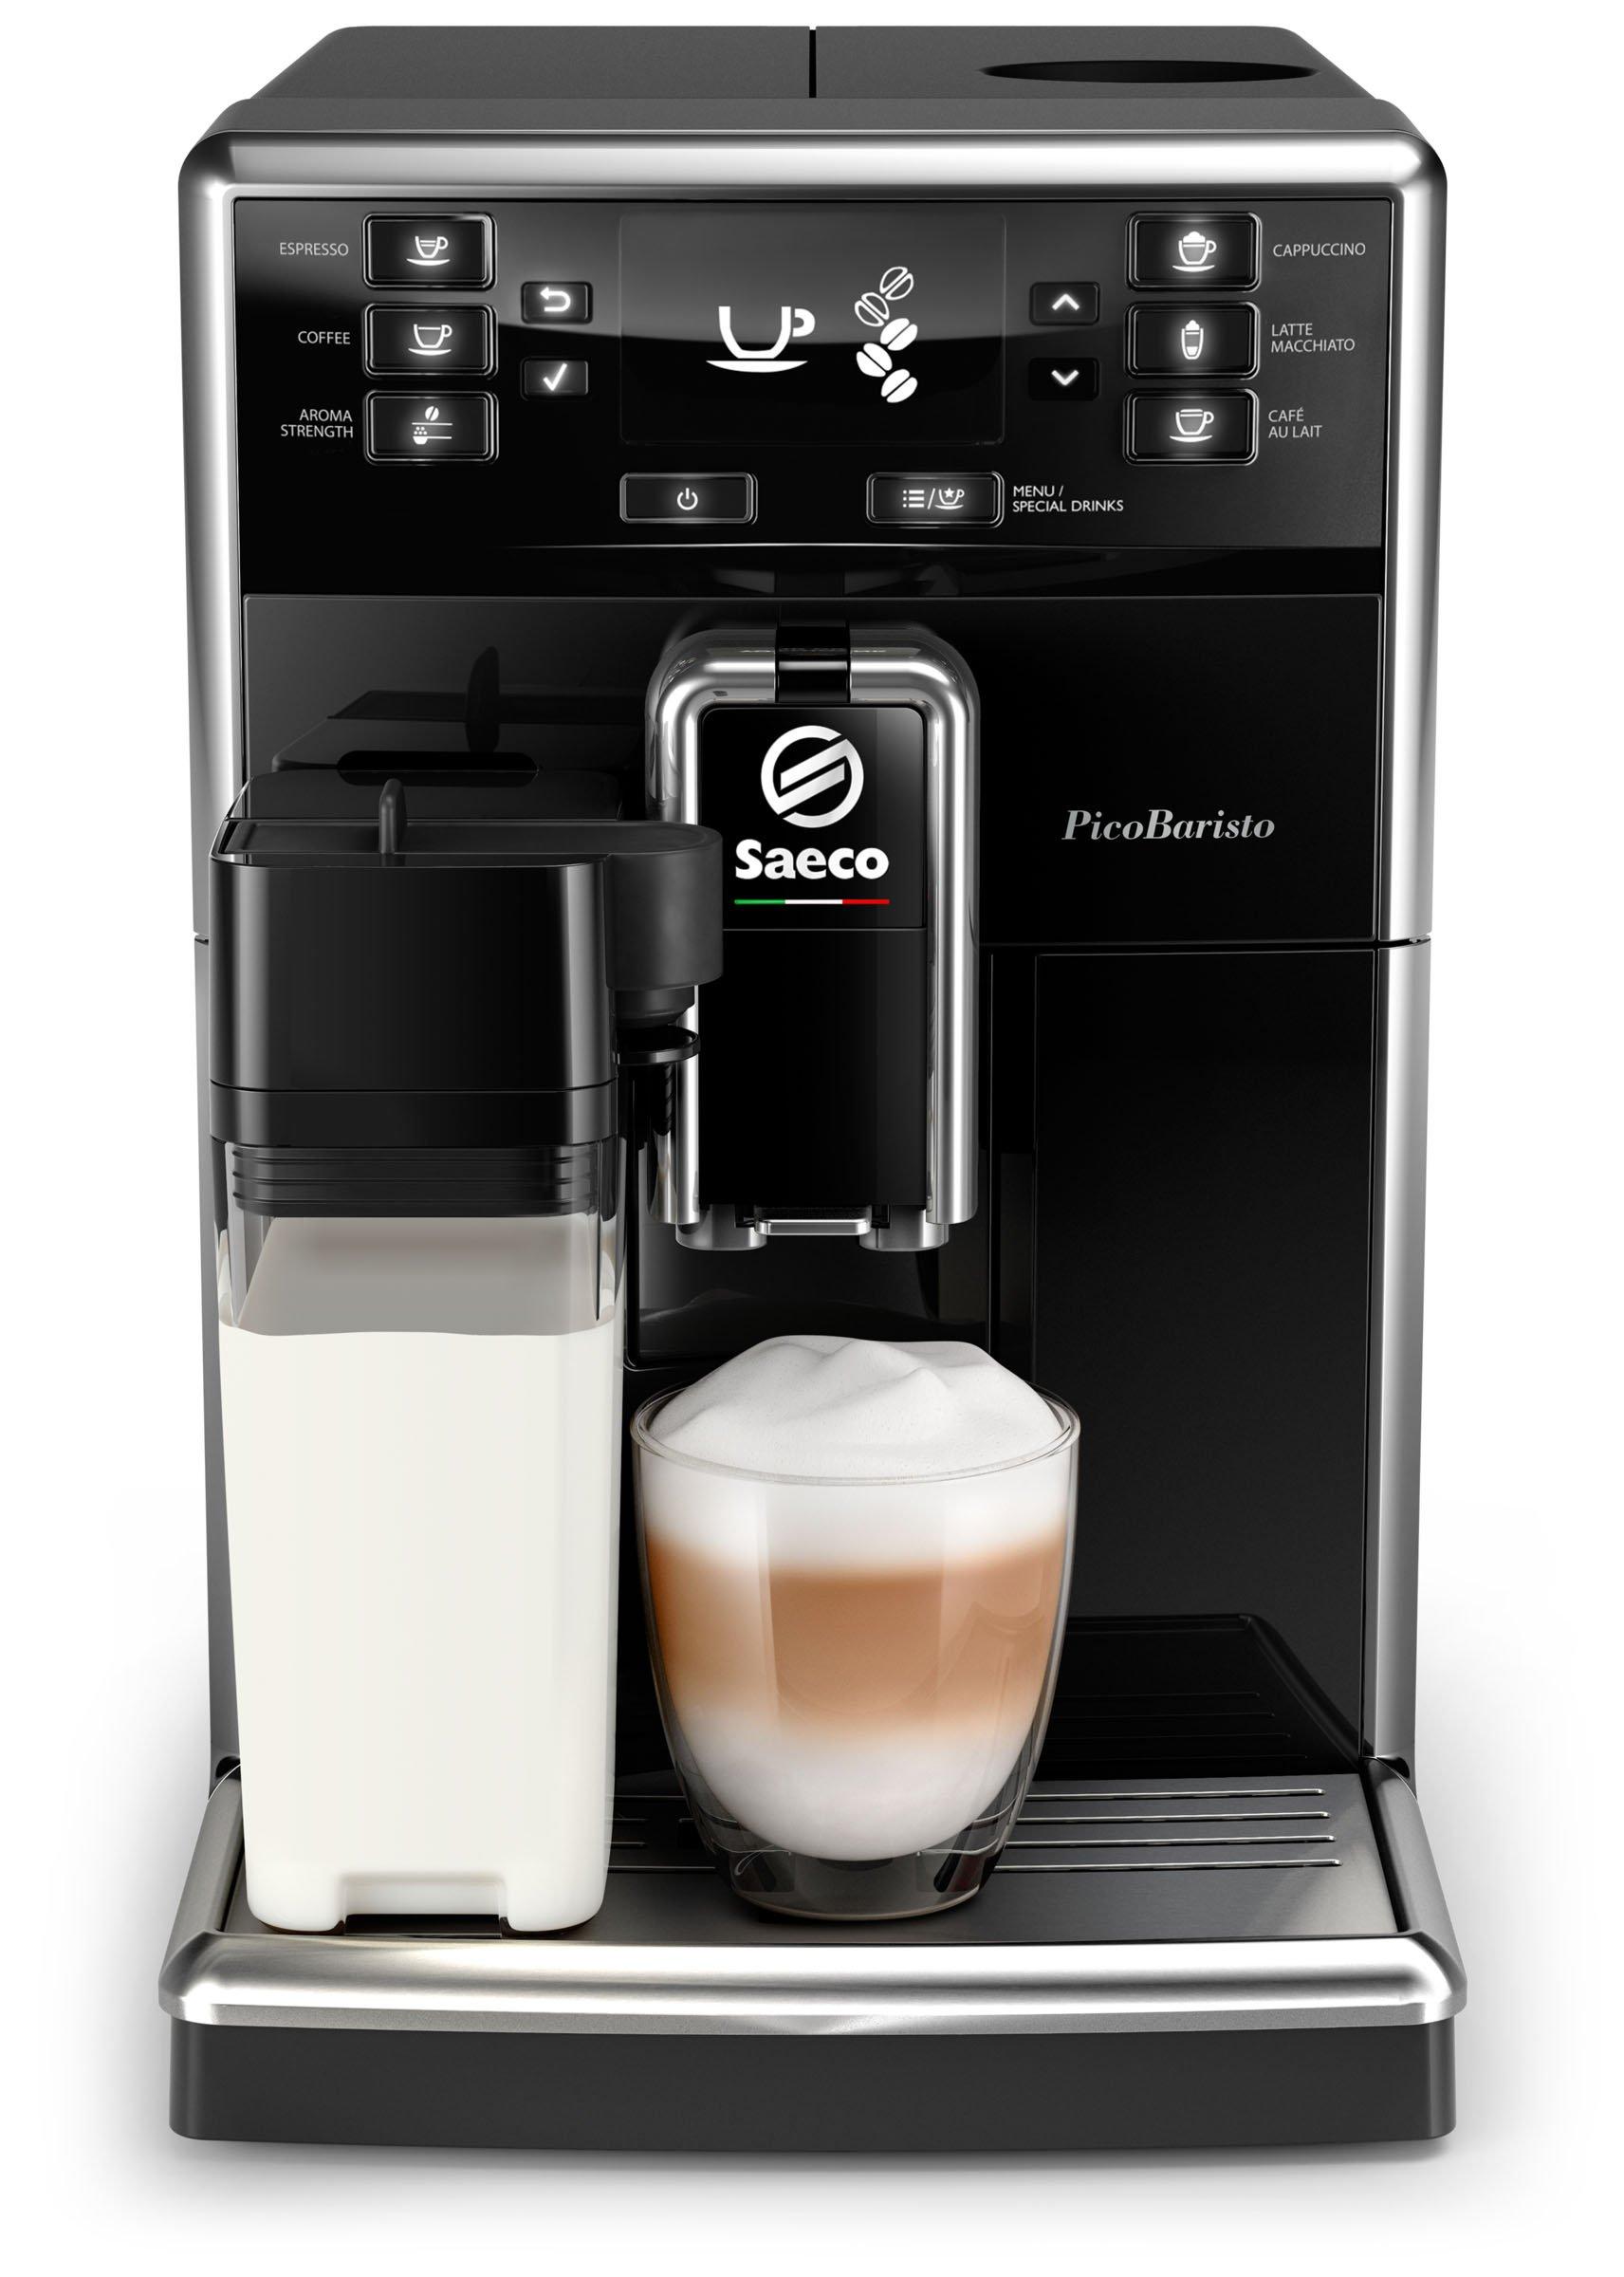 Saeco SM5460/10 PicoBaristo Kaffeevollautomat (Milchsystem) schwarz